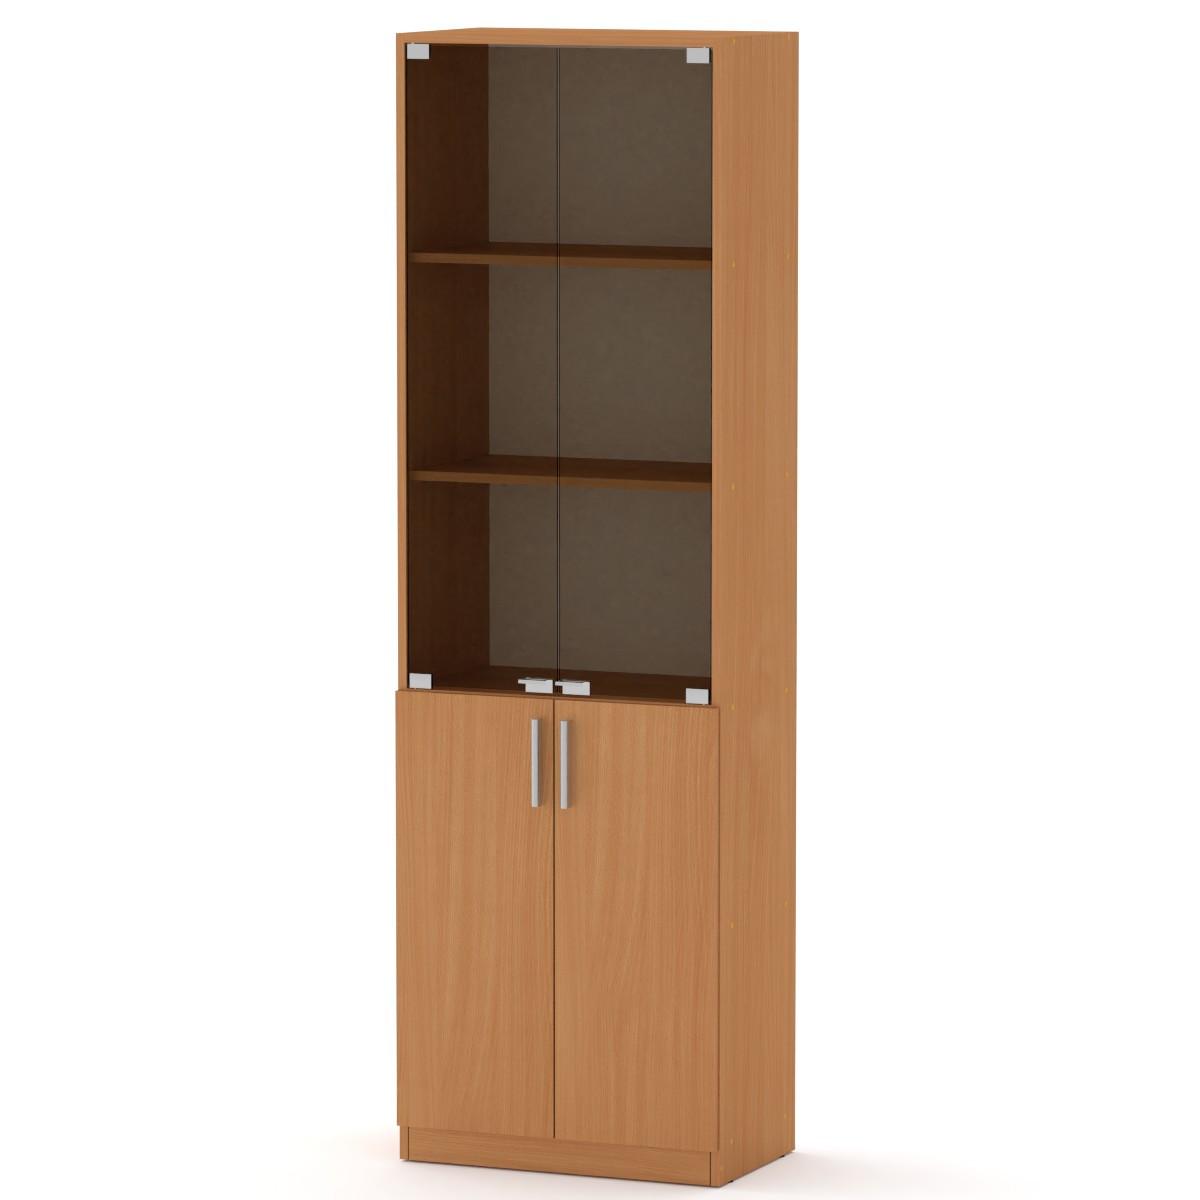 Шкаф книжный КШ-6 бук Компанит (60х37х195 см)